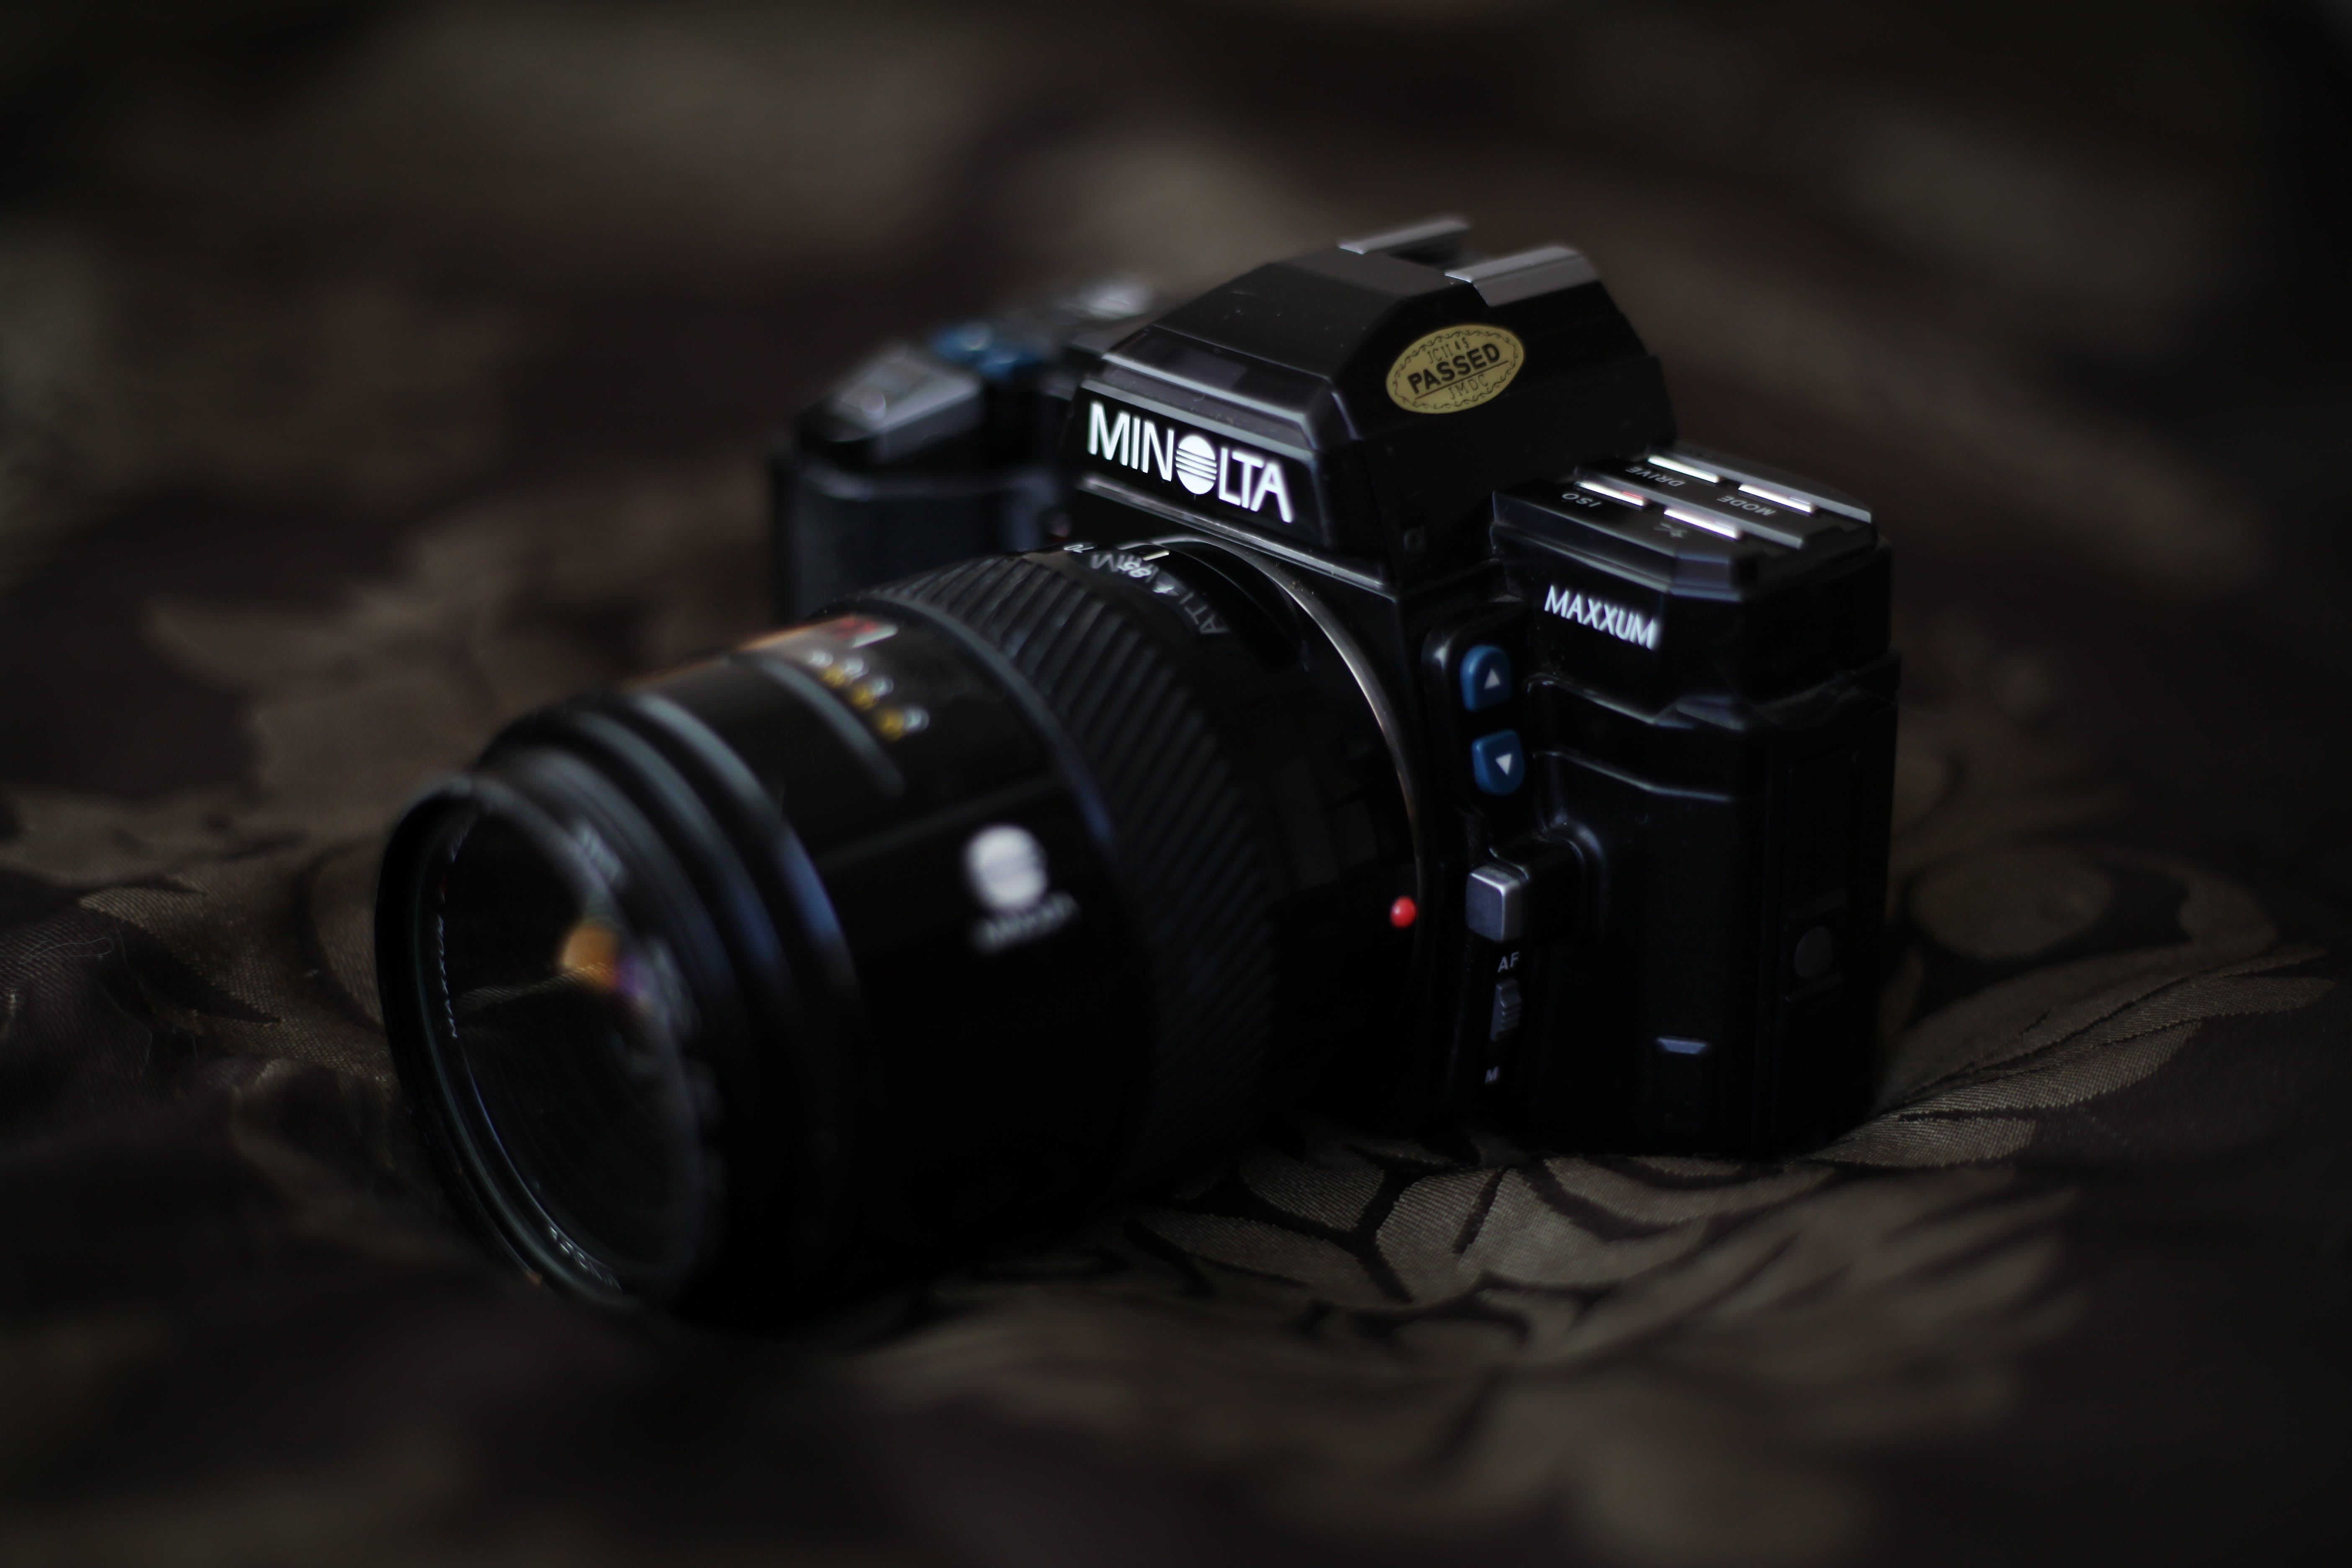 Selective Focus Photo of Black Minolta SLR Camera